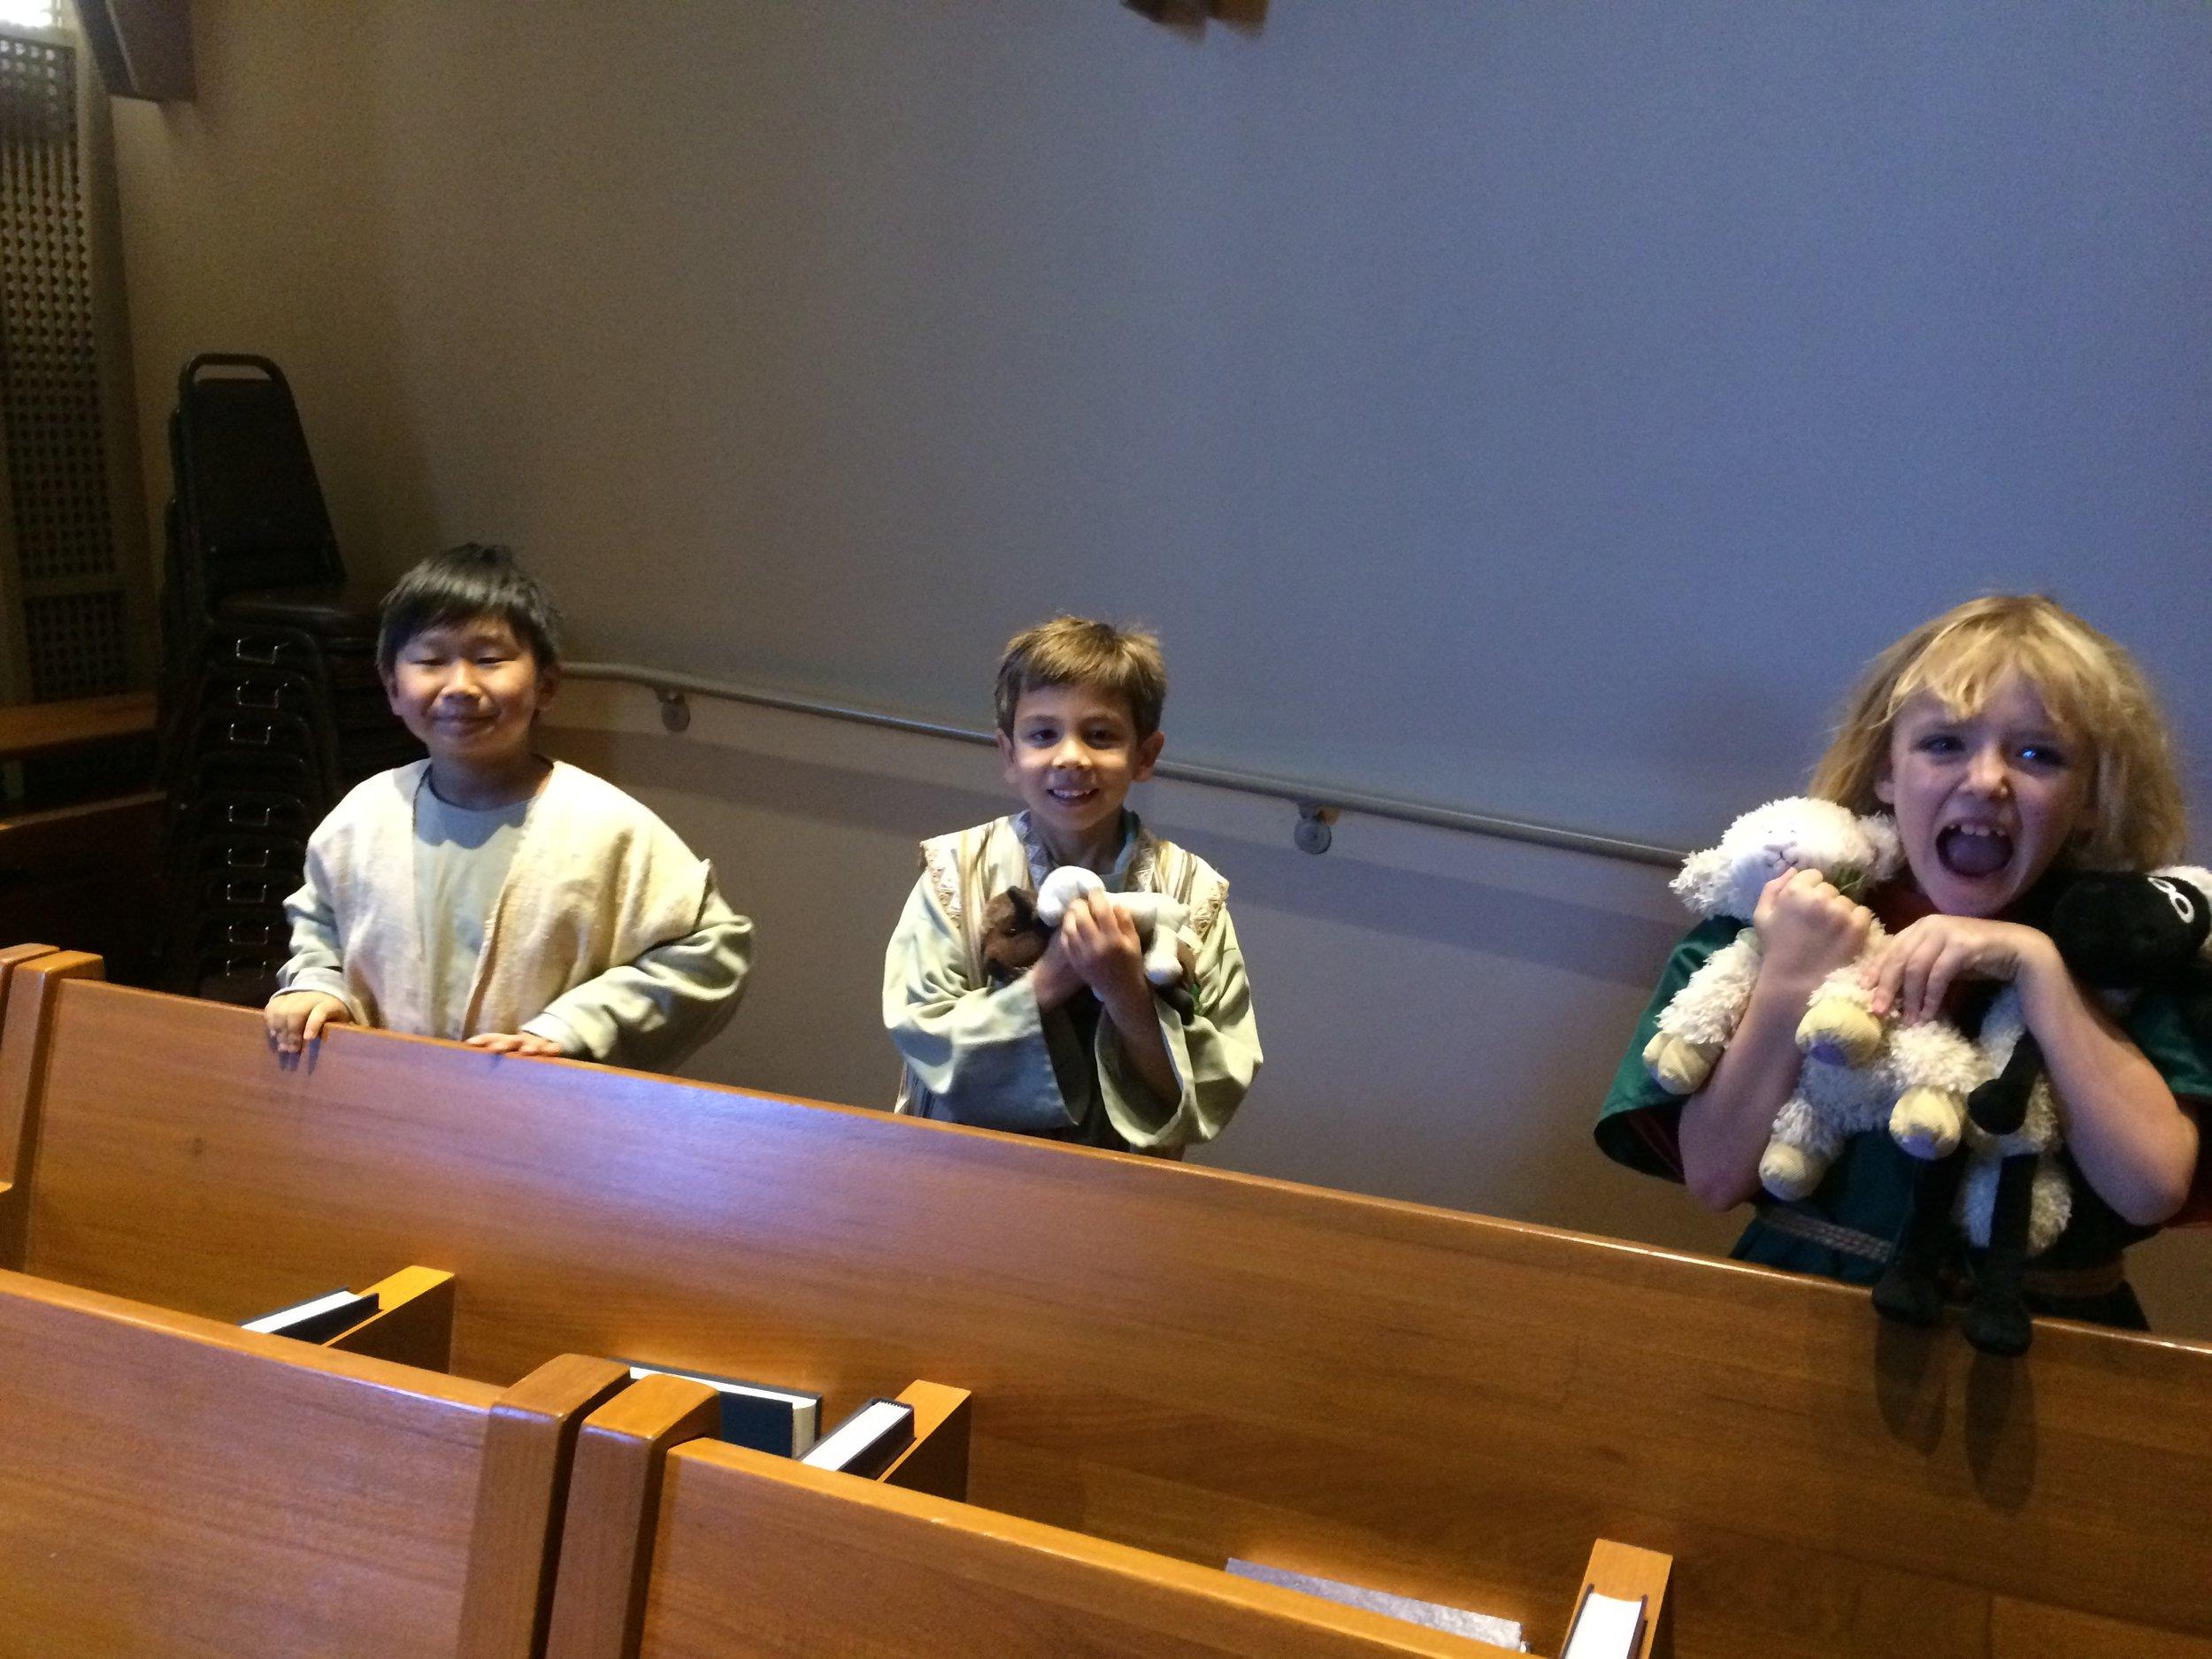 claremont-presbyterian-church-children-13.JPG